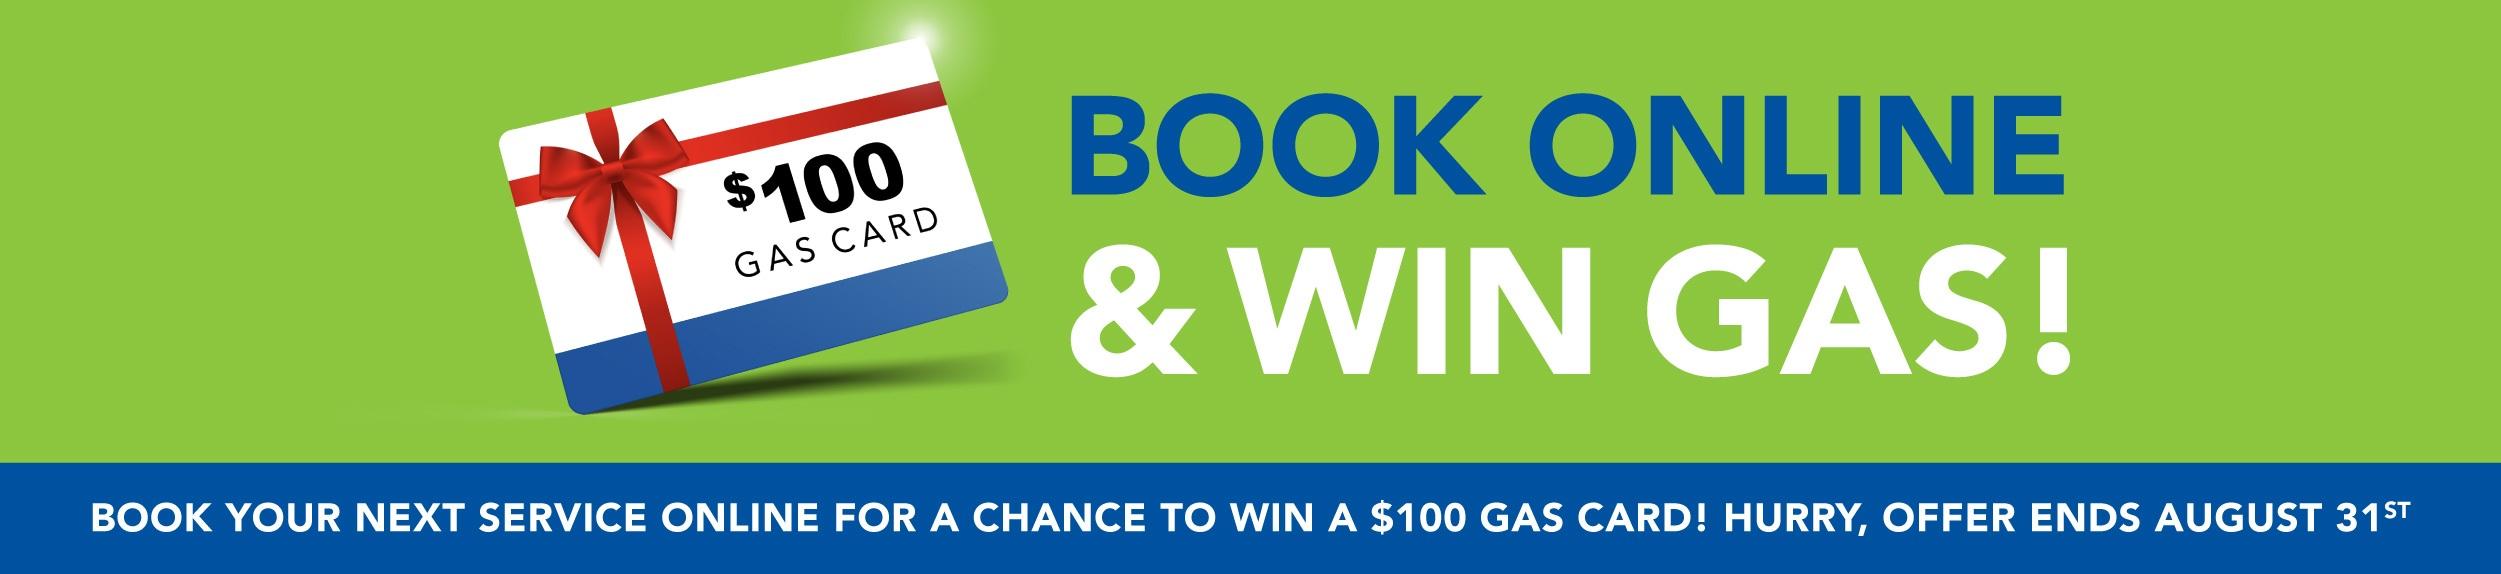 APP $100 Gas Card Book Online_Header copy